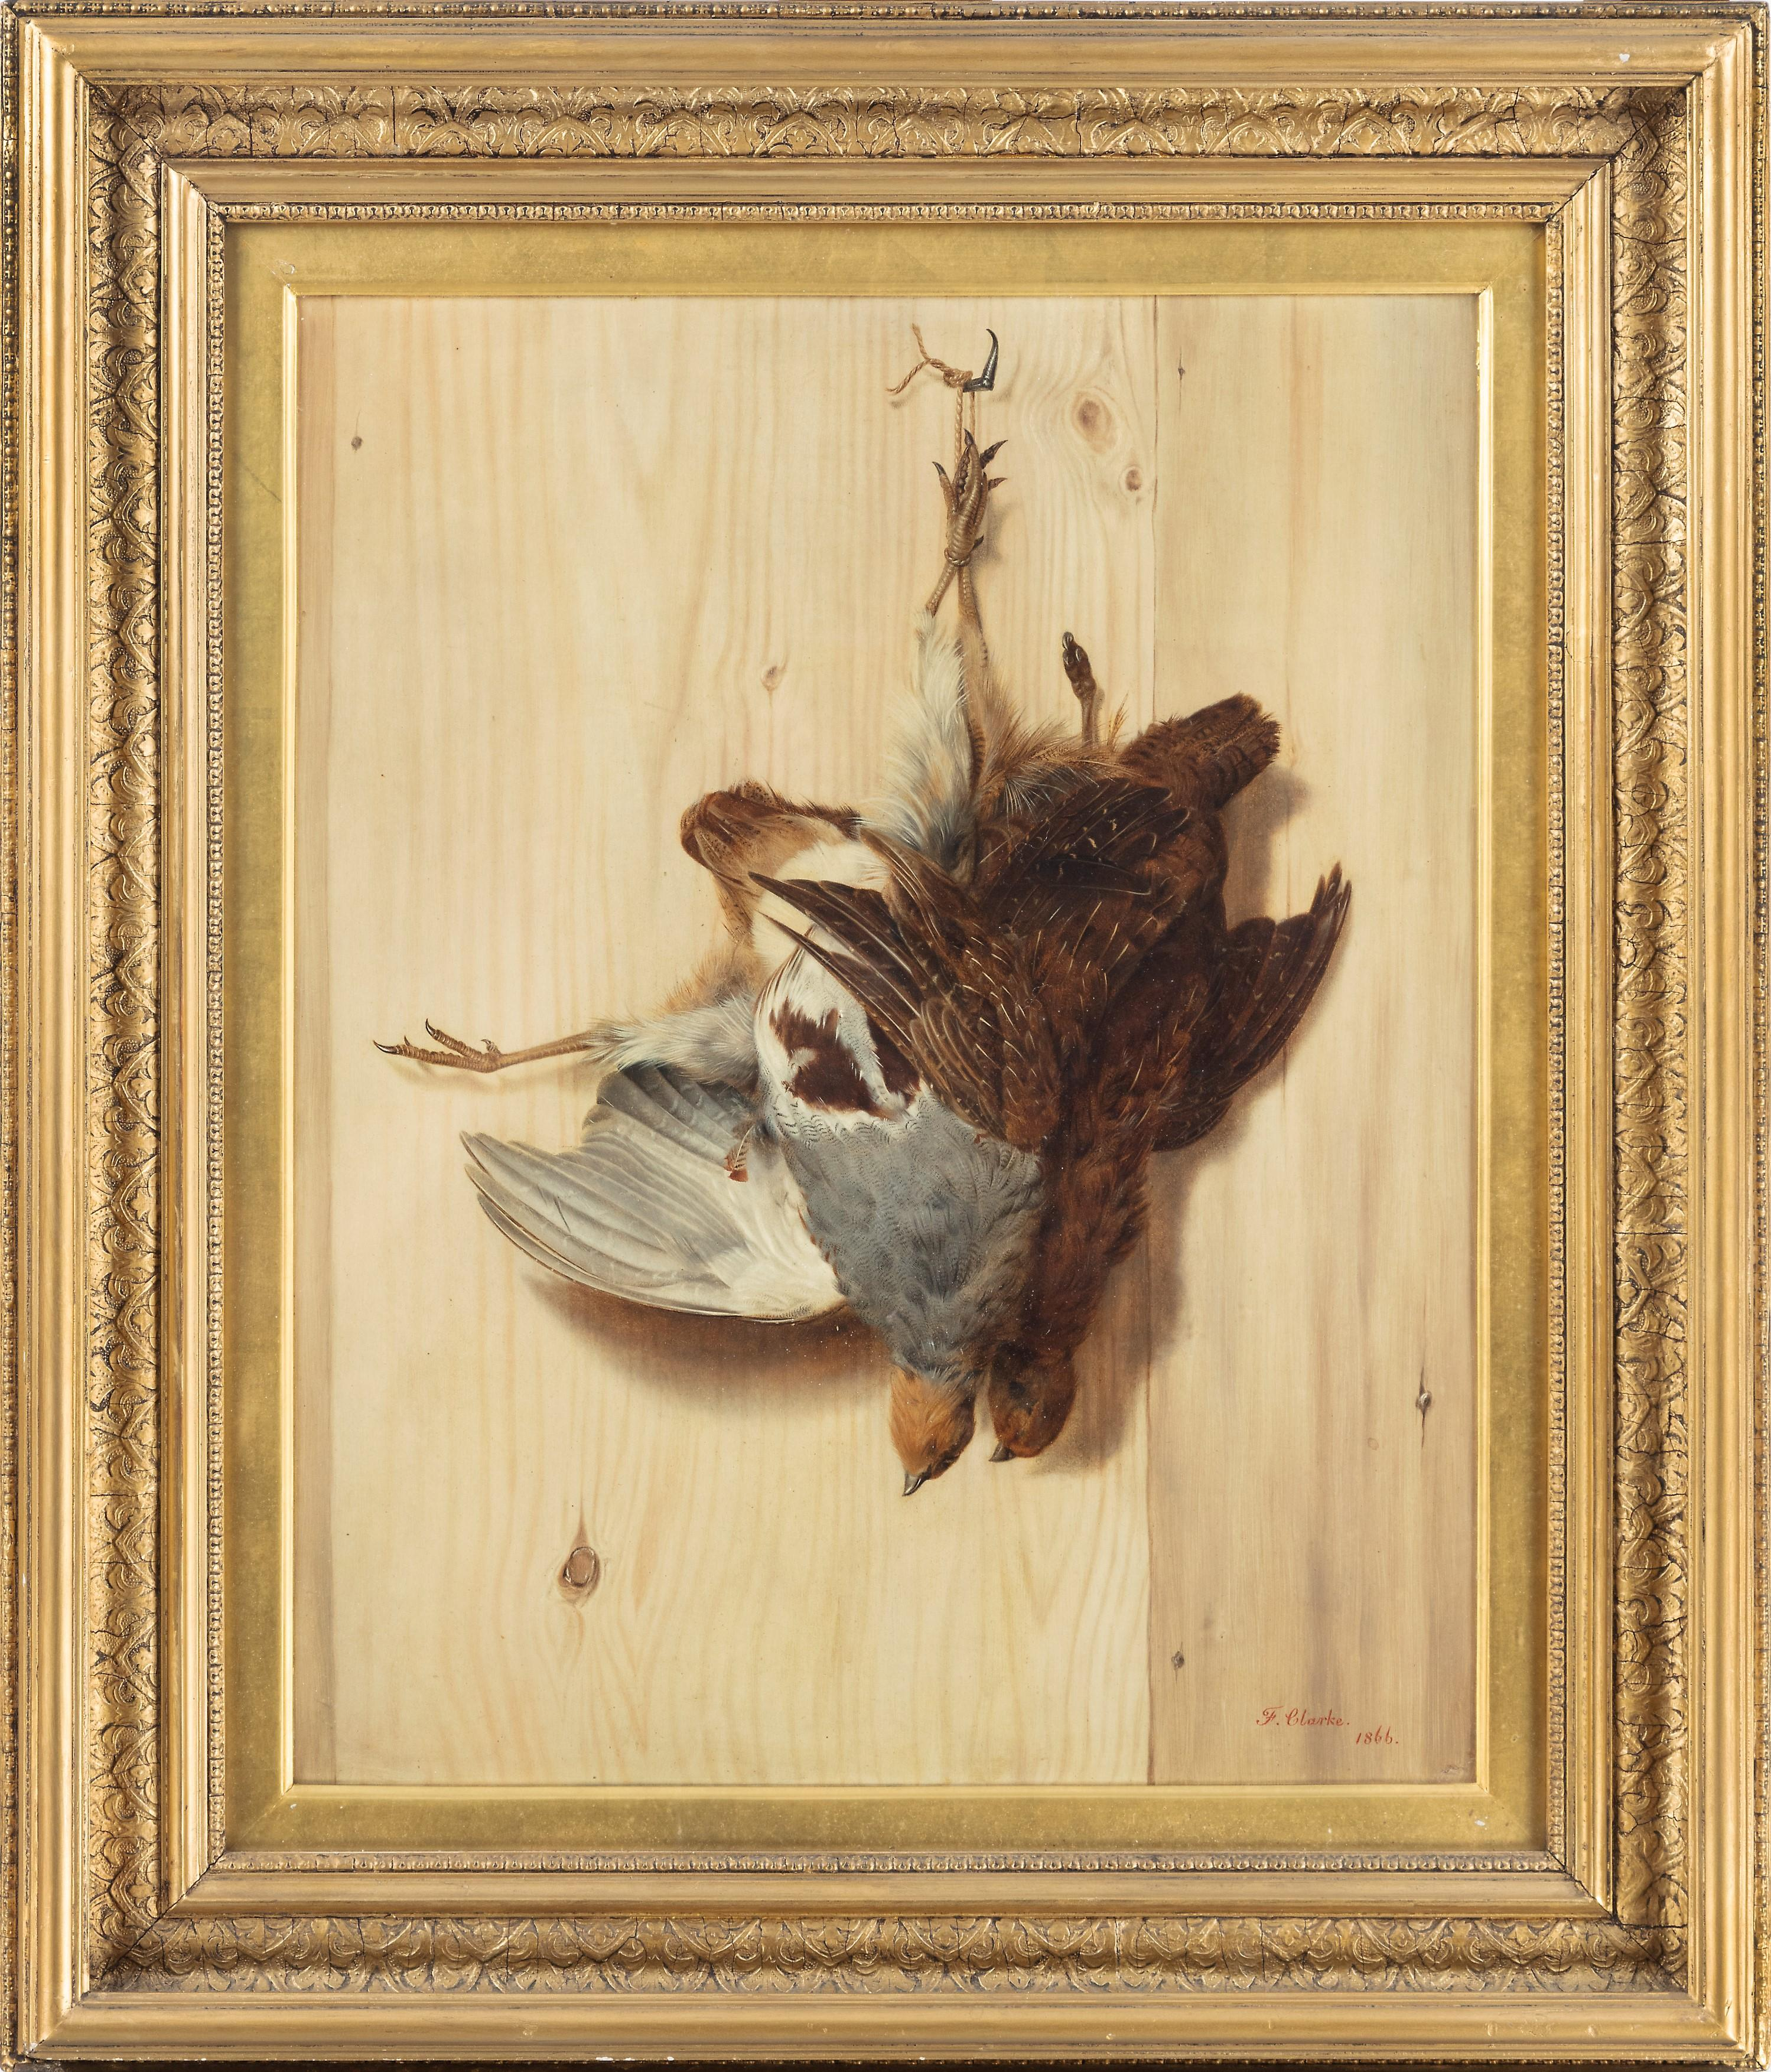 A hunting trompe l'oeil still life of a brace of partridge